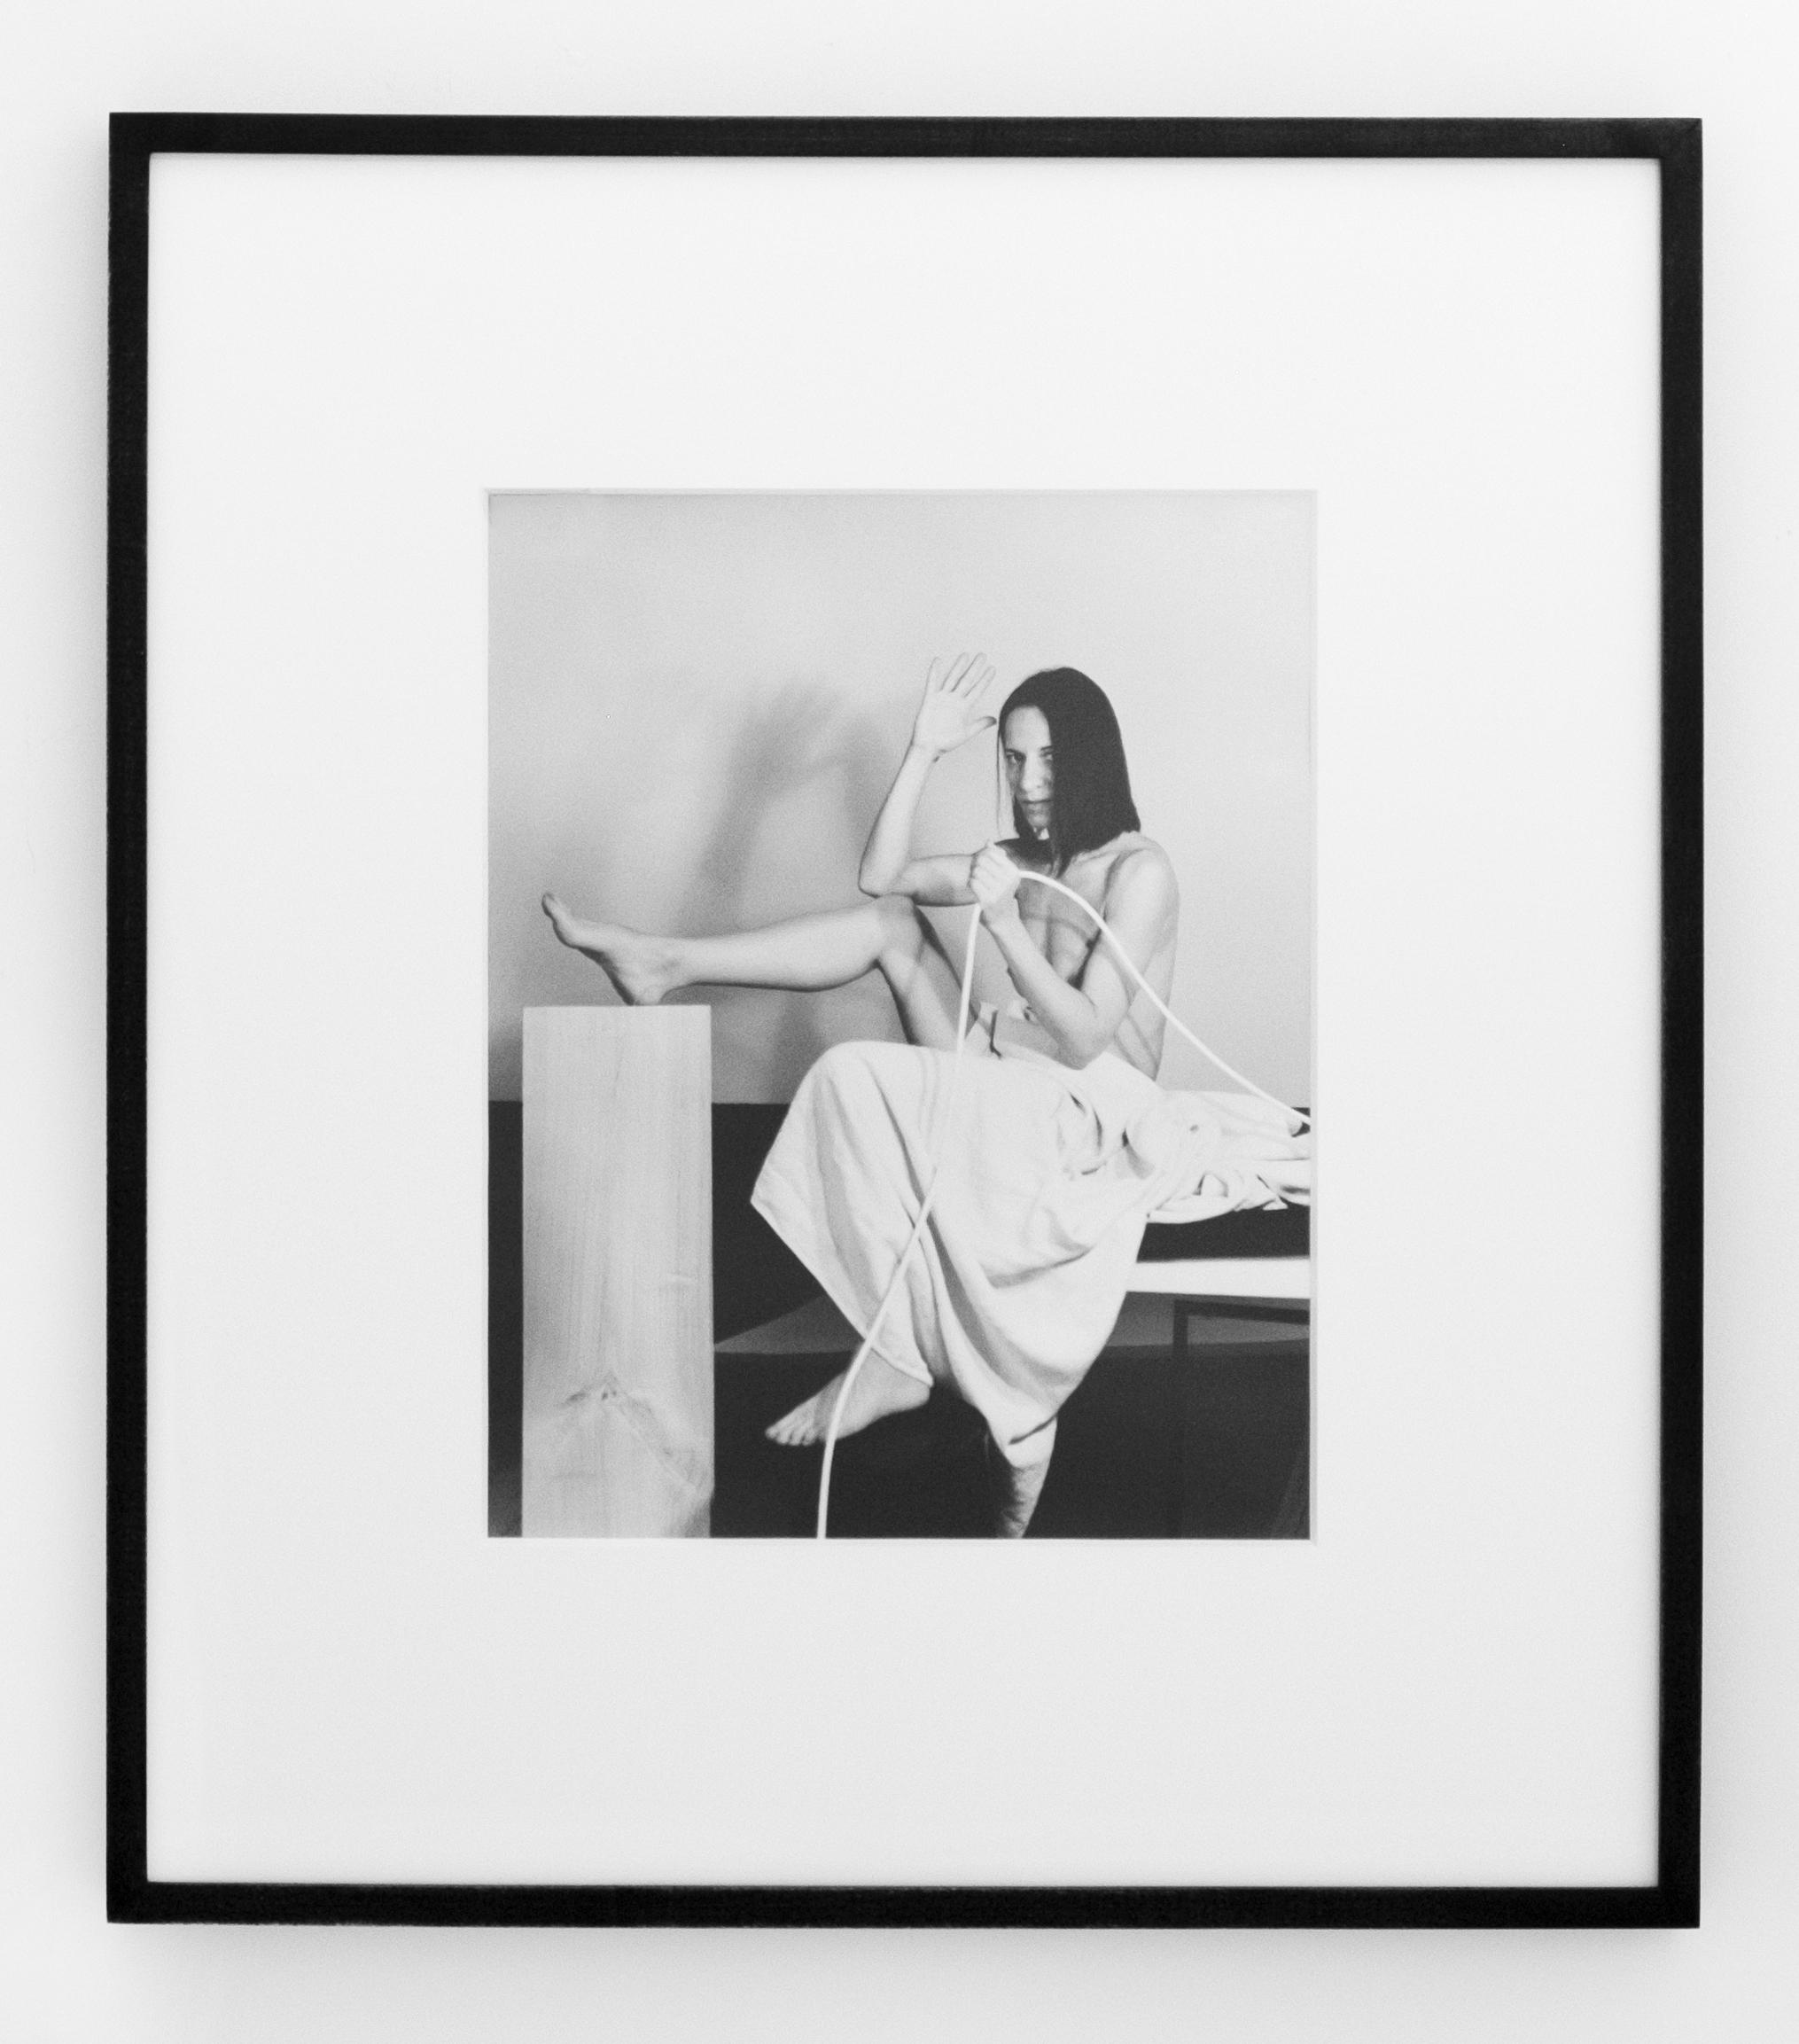 Ana Gaze Study 3 , 2019, gelatin silver print, 20 x 24 inches framed